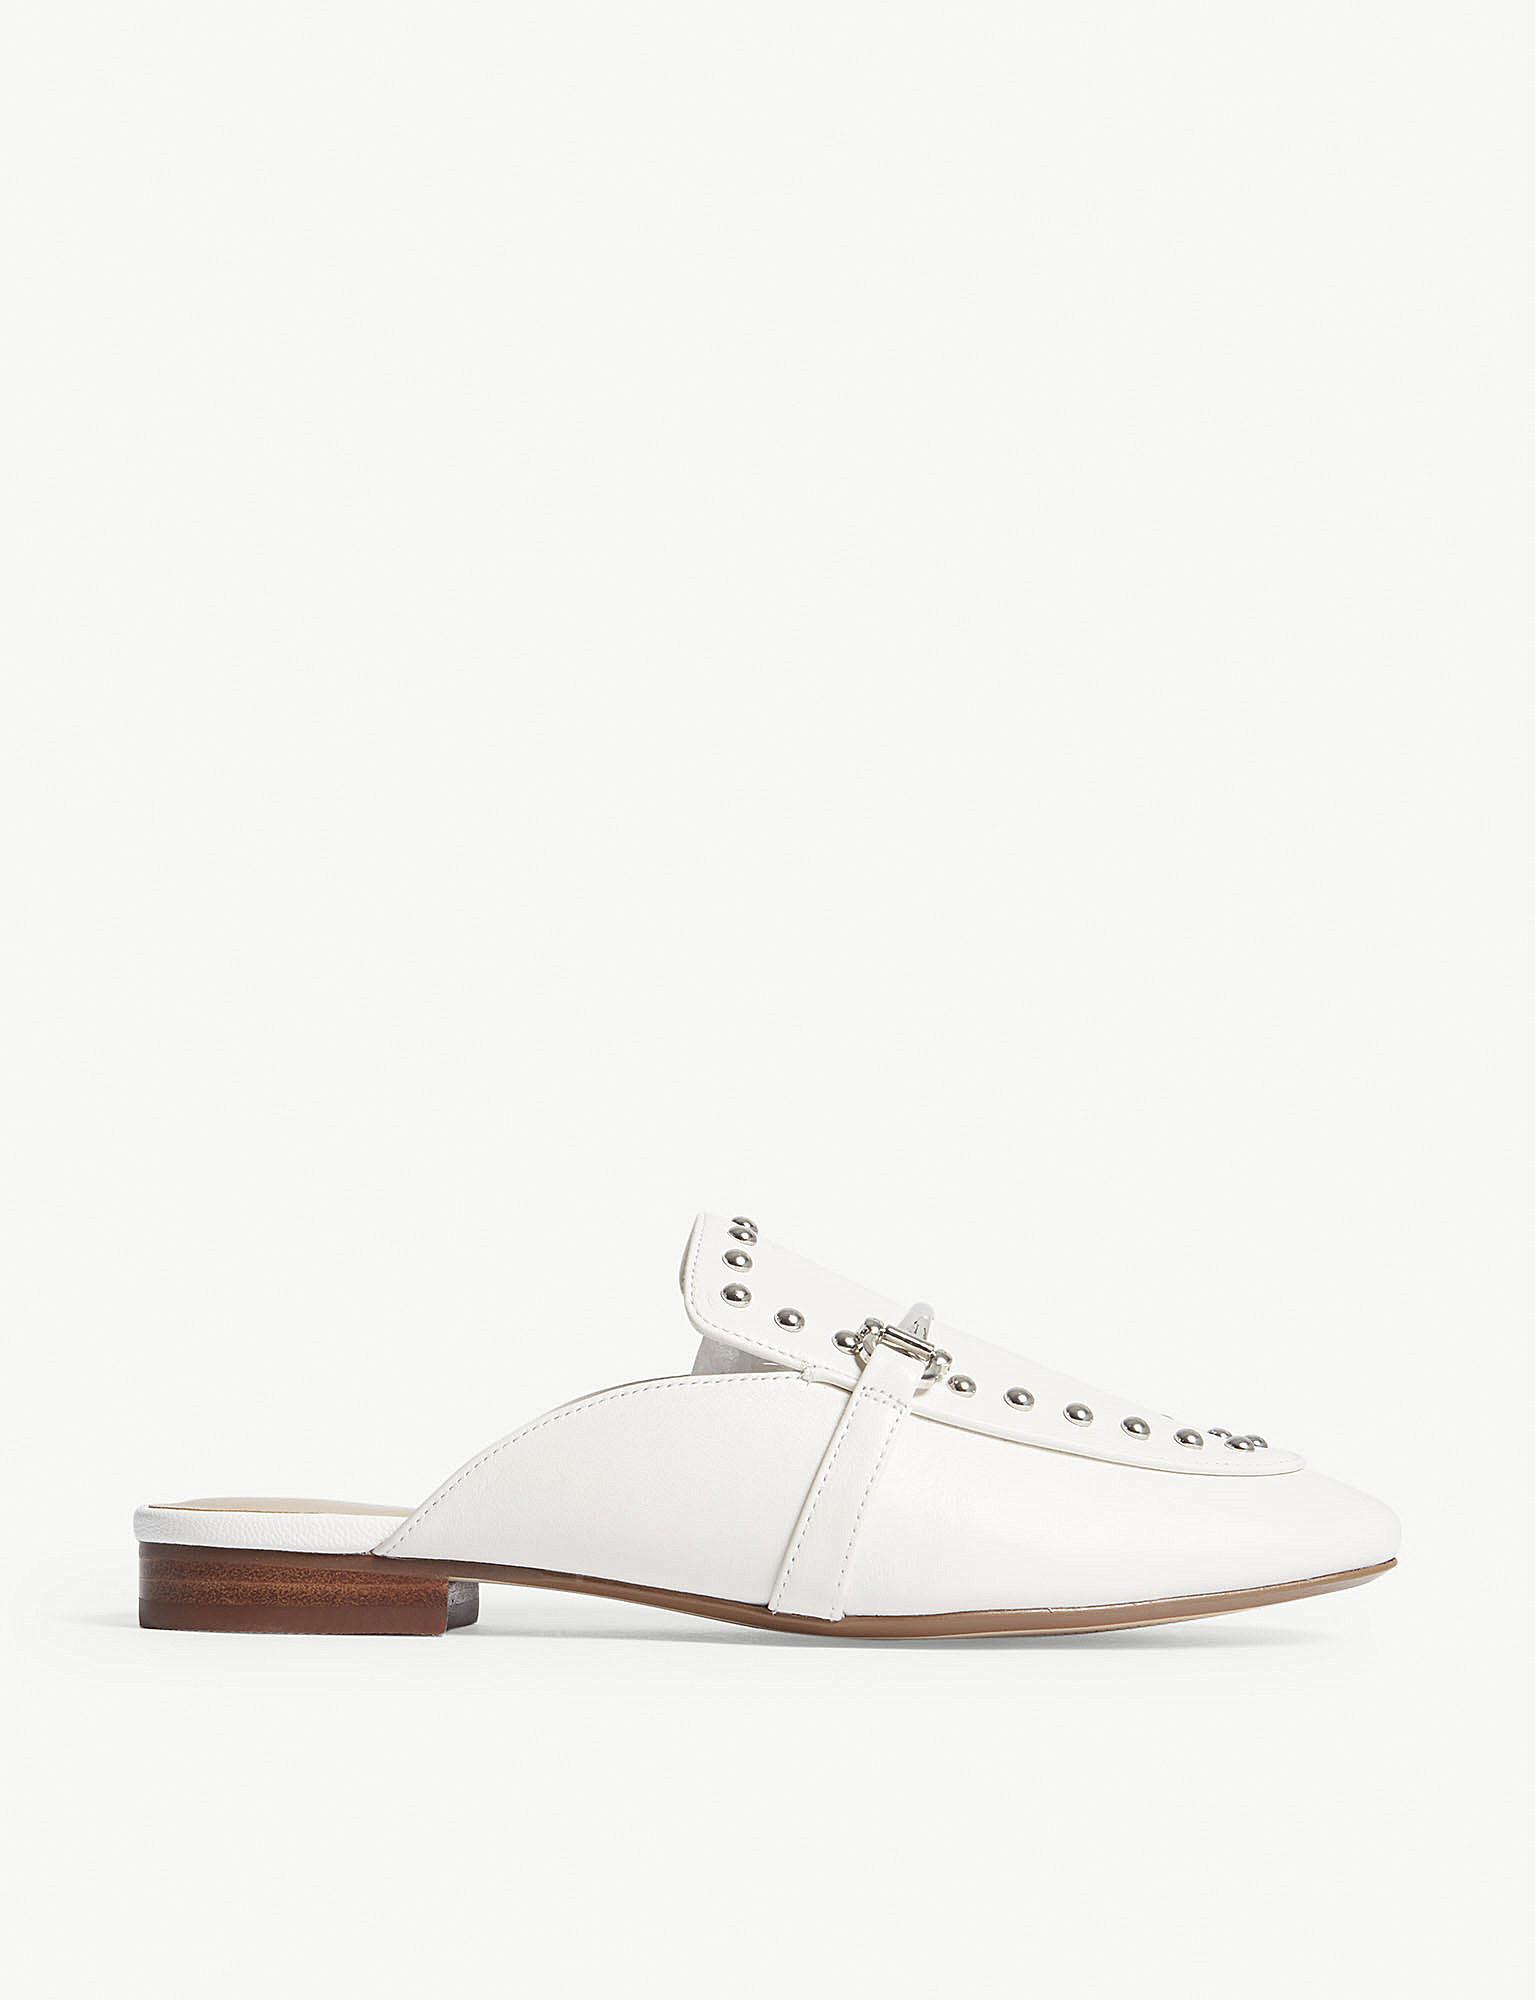 72f43c49526 ALDO Vergemoli Studded Suede Loafers in White - Lyst